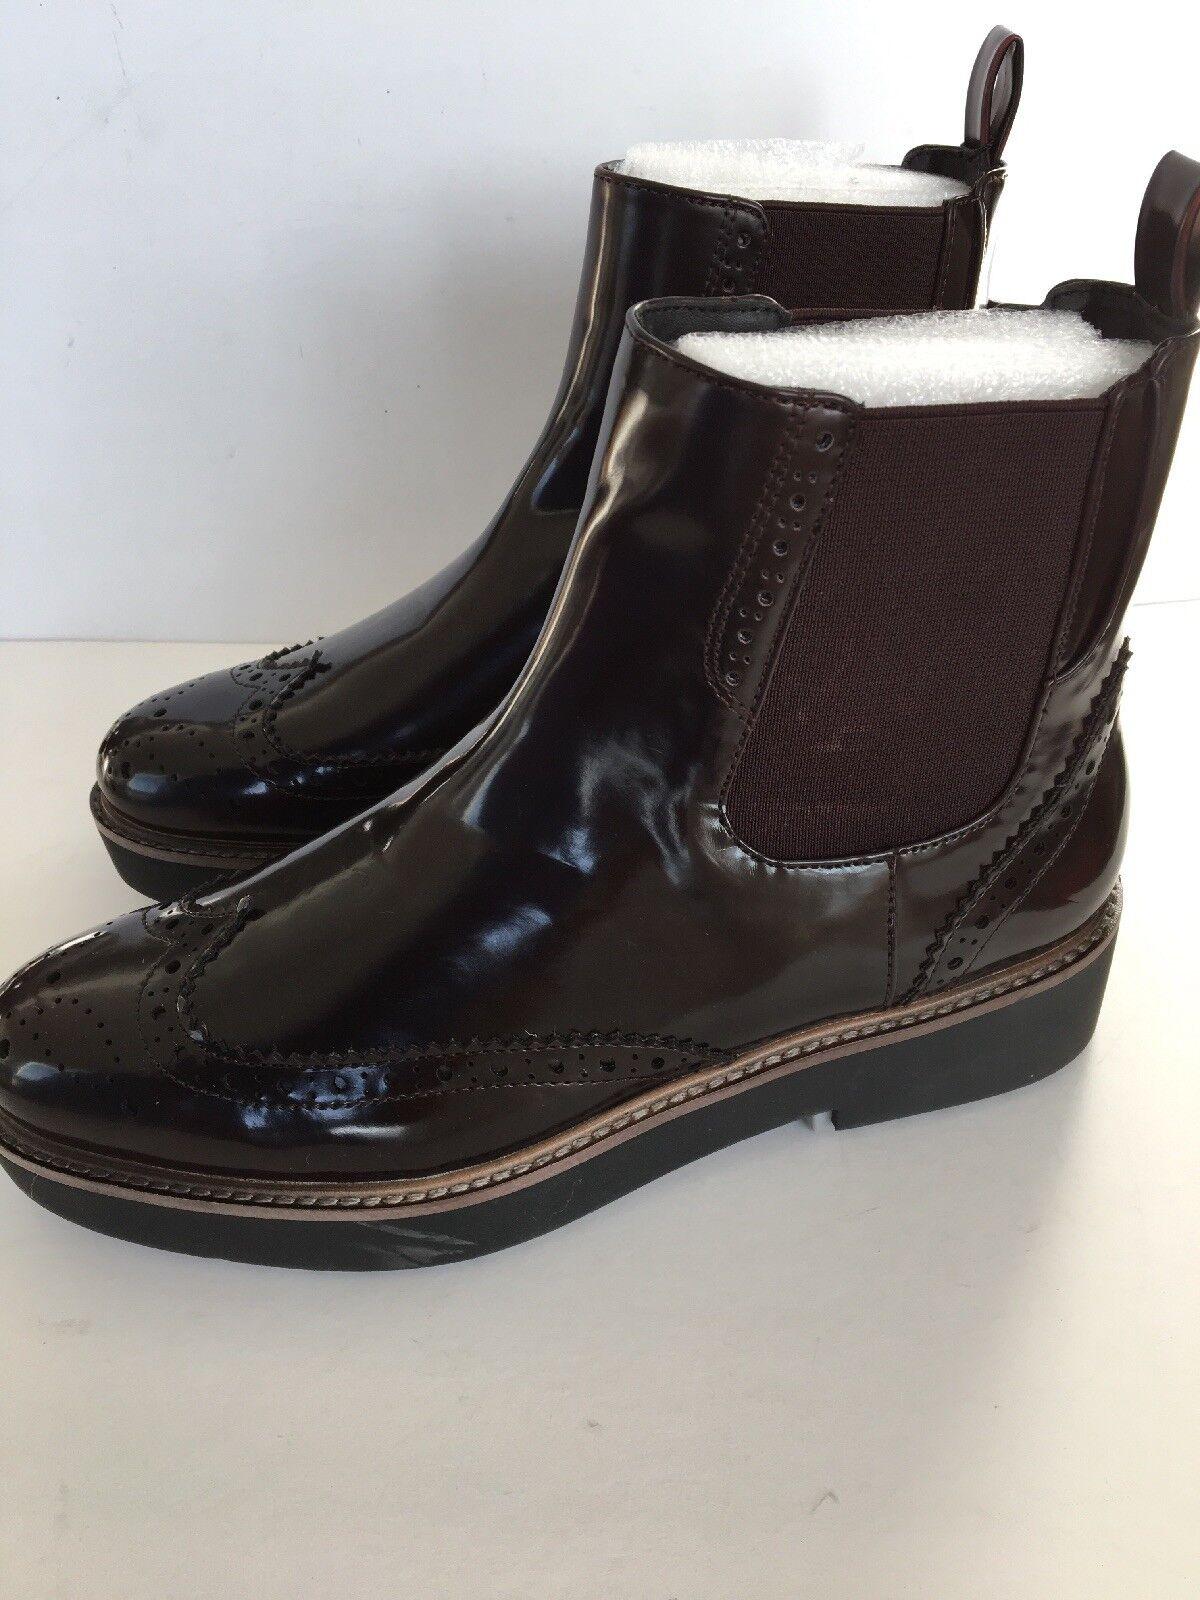 Zara Shiny marrón Pull On Ankle Chelsea botas NWT Talla 7.5 UK 5